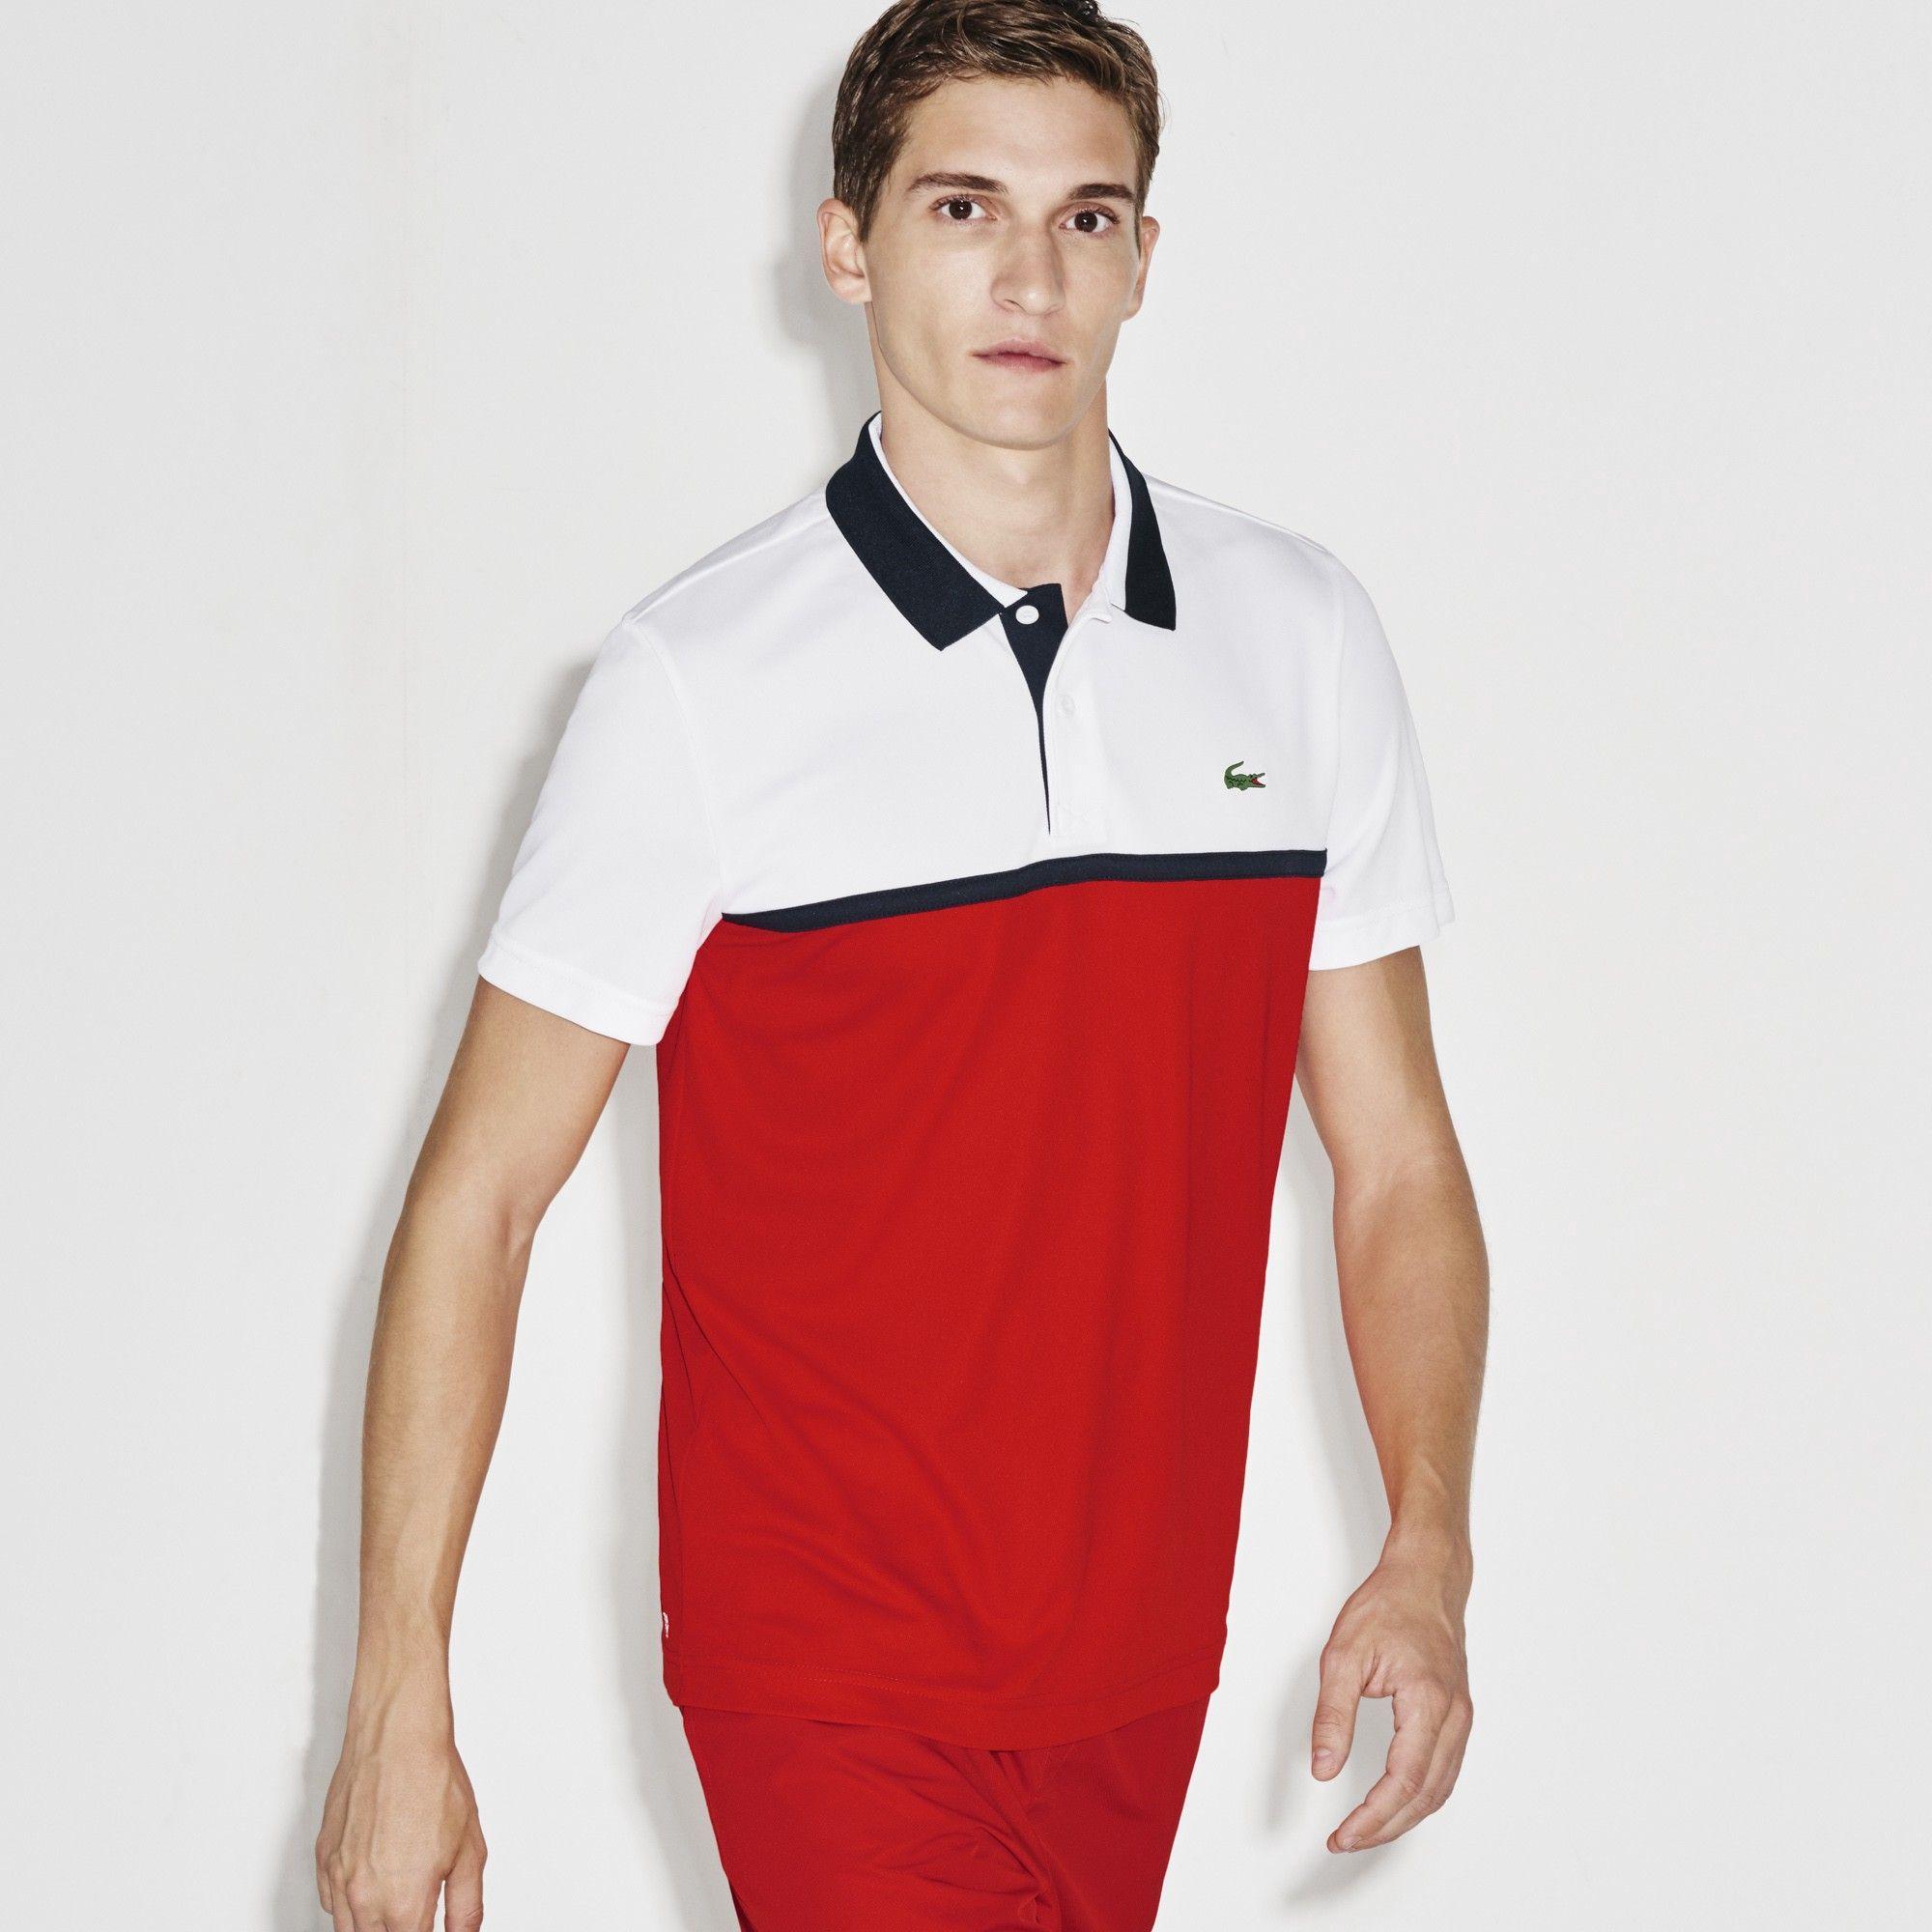 5dee0b1e LACOSTE Men's SPORT Ultra Dry Resistant Piqué Tennis Polo Shirt - white/lust  red-navy blue. #lacoste #cloth #